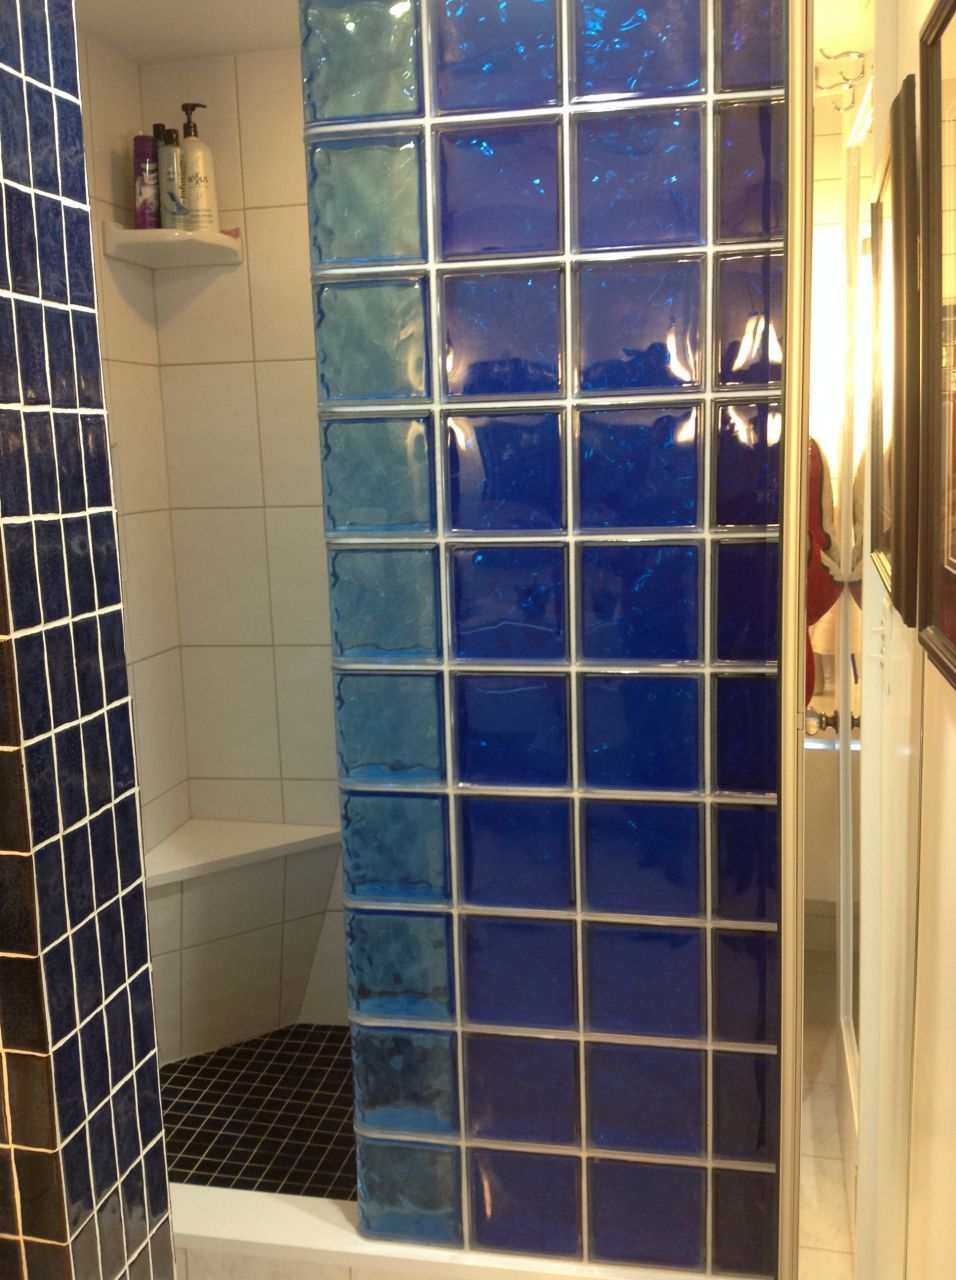 Innovate Building Solutions Blog Bathroom Kitchen Basement Remodeling Design Ideas Tips Plans Glass Blocks Wall Bathtub Shower Remodel Glass Block Shower